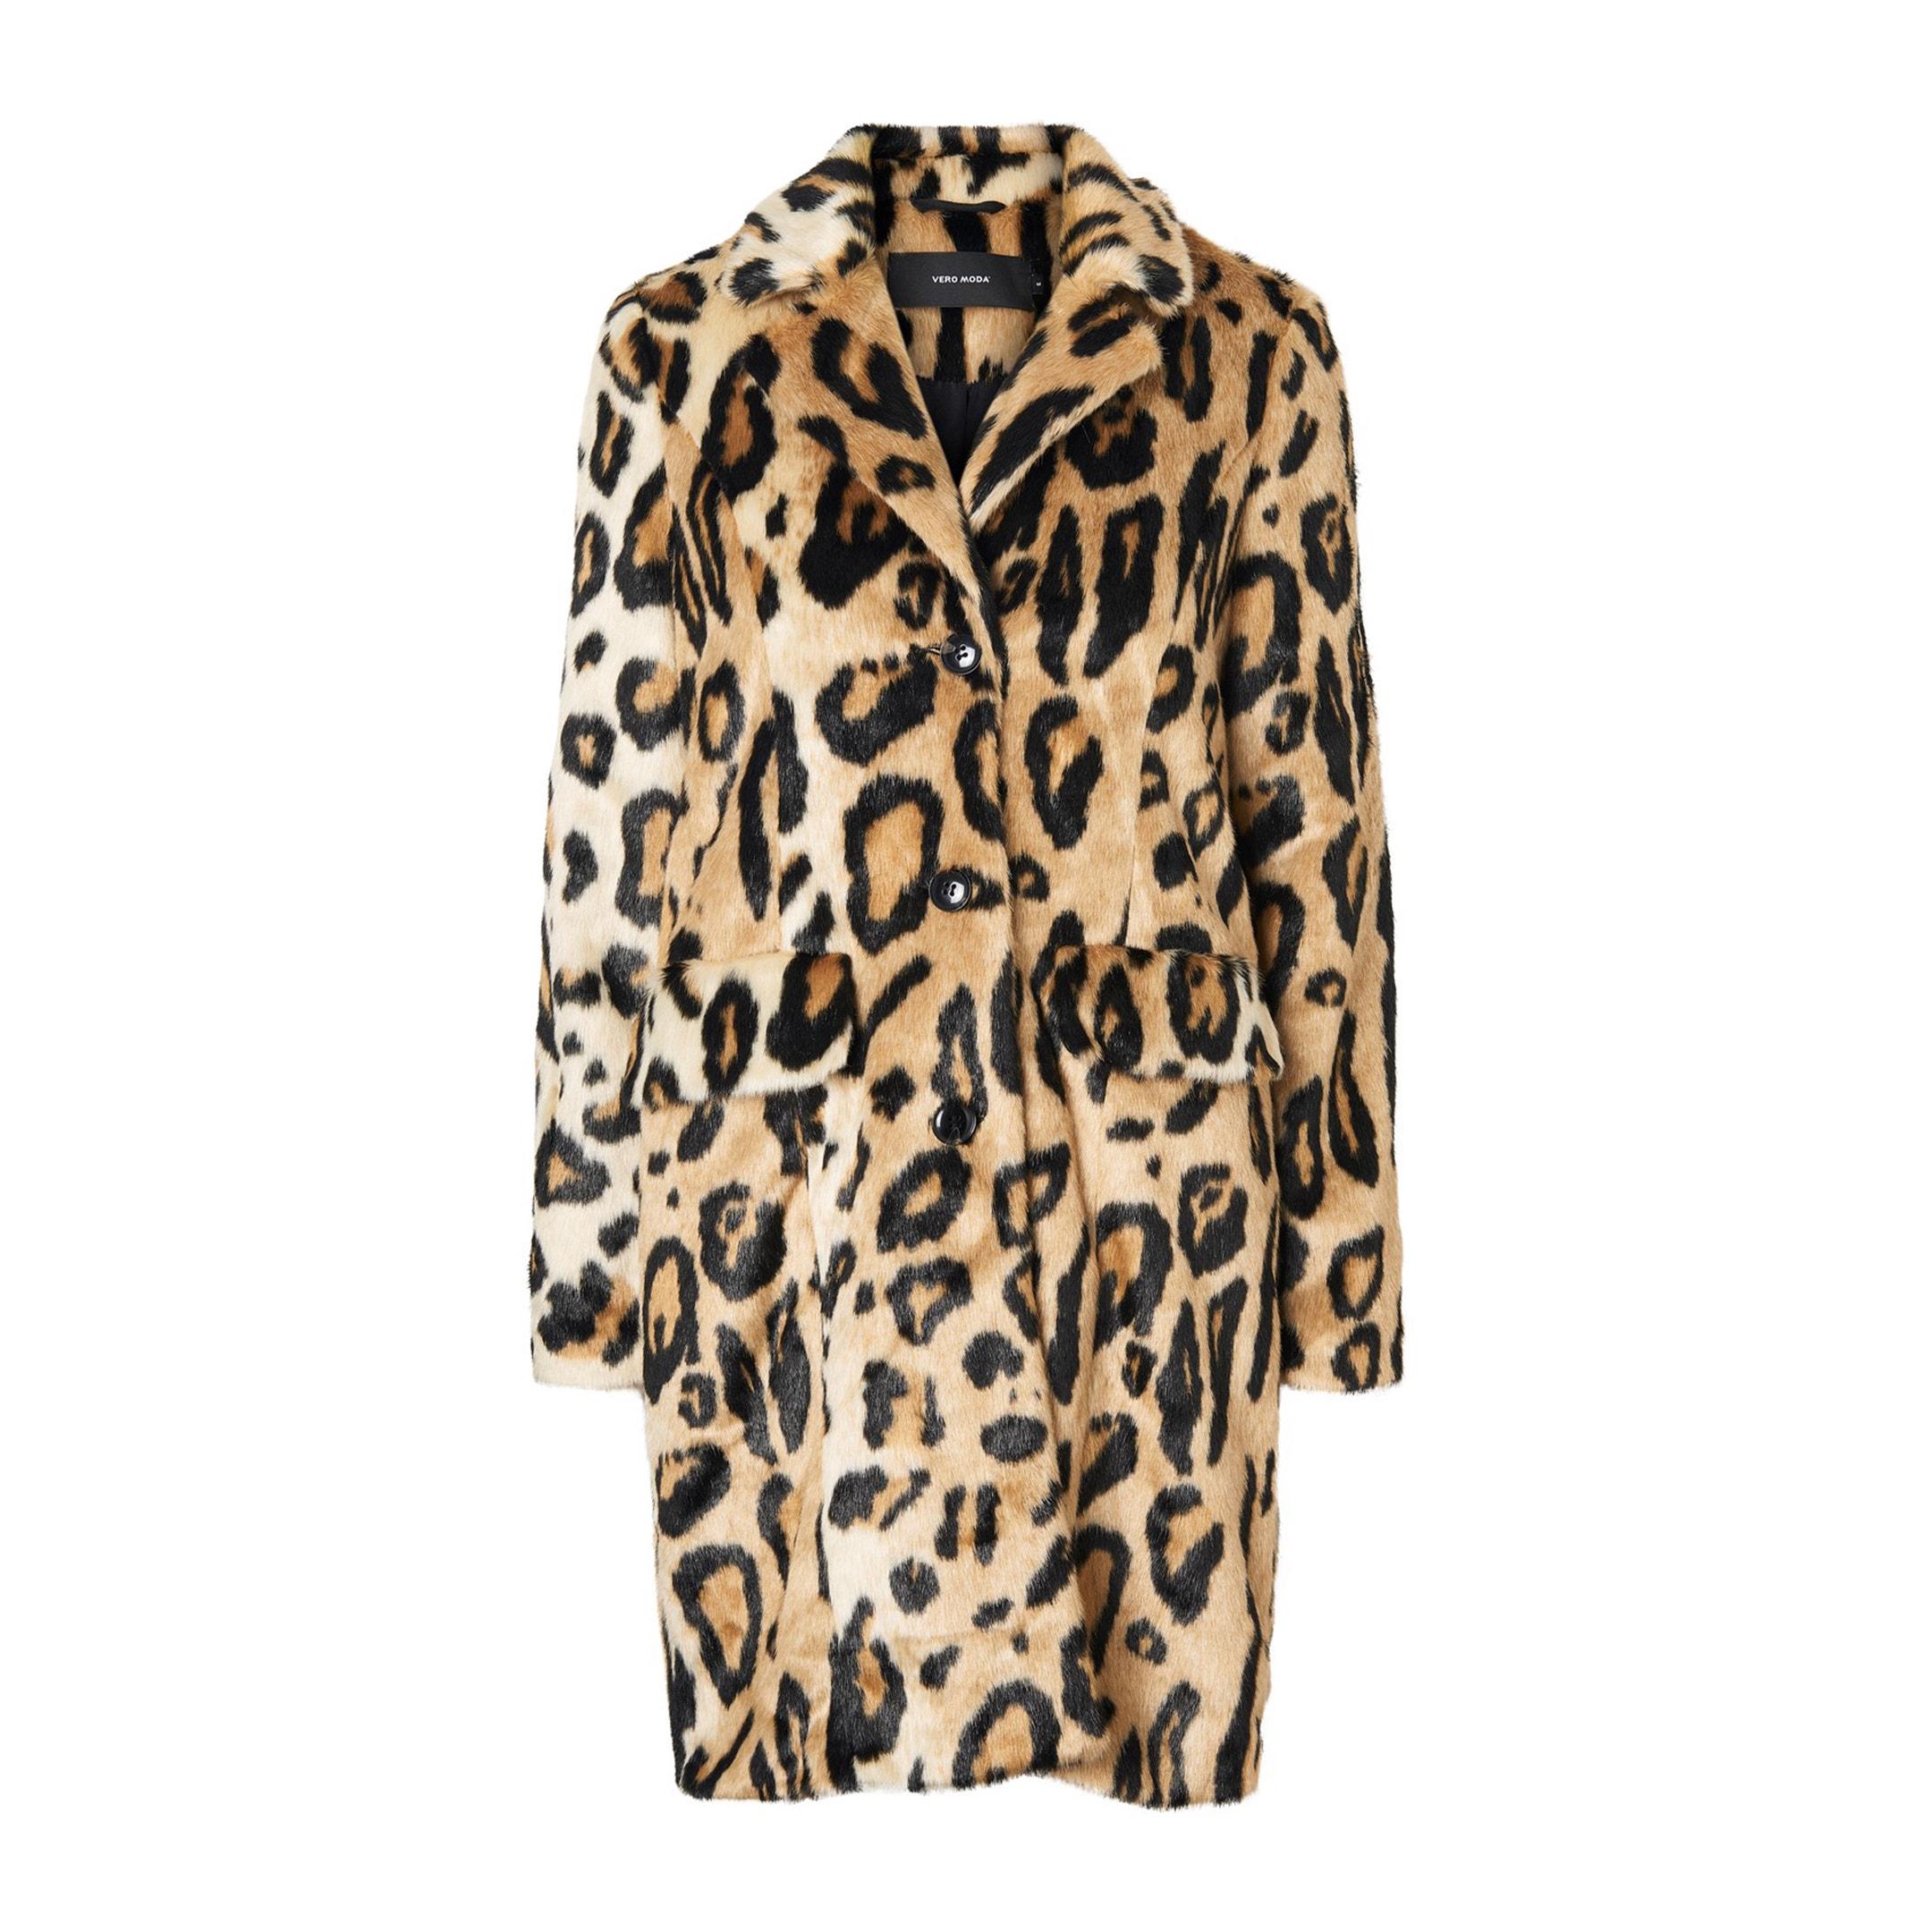 GFI244_004879 NP1A Imprime leopard UC2050292.jpg